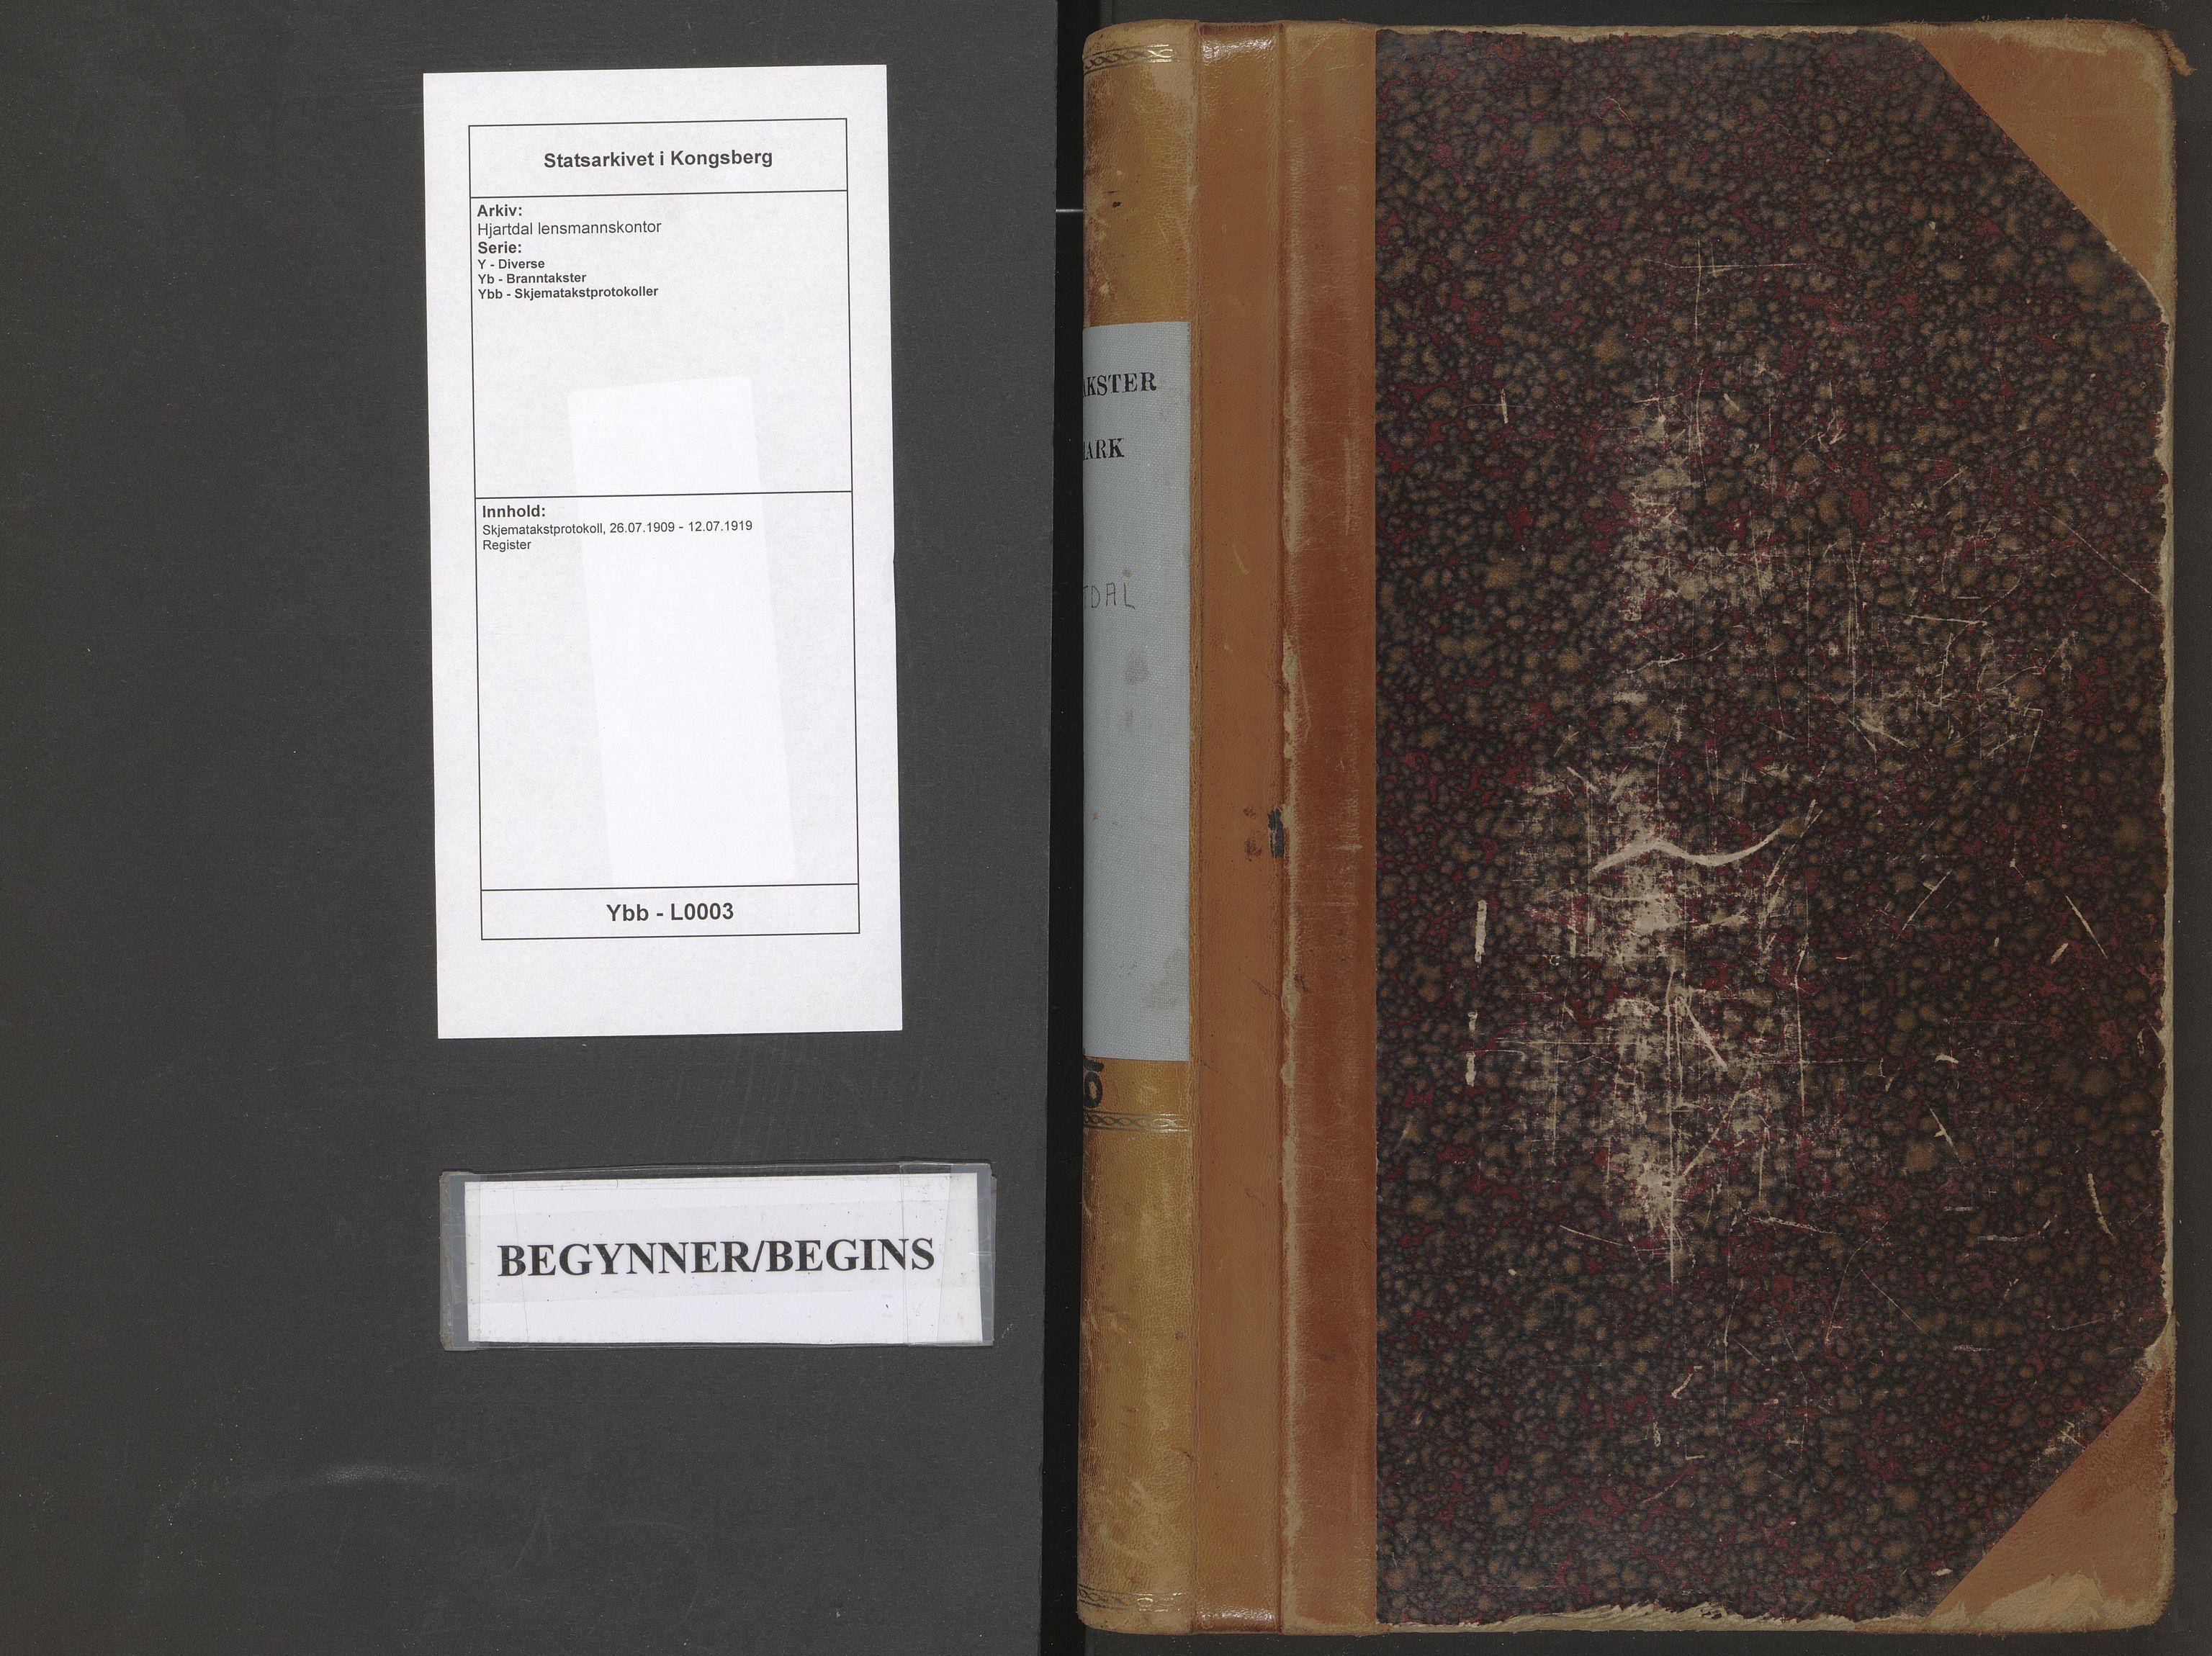 SAKO, Hjartdal lensmannskontor, Y/Yb/Ybb/L0003: Skjematakstprotokoll, 1909-1919